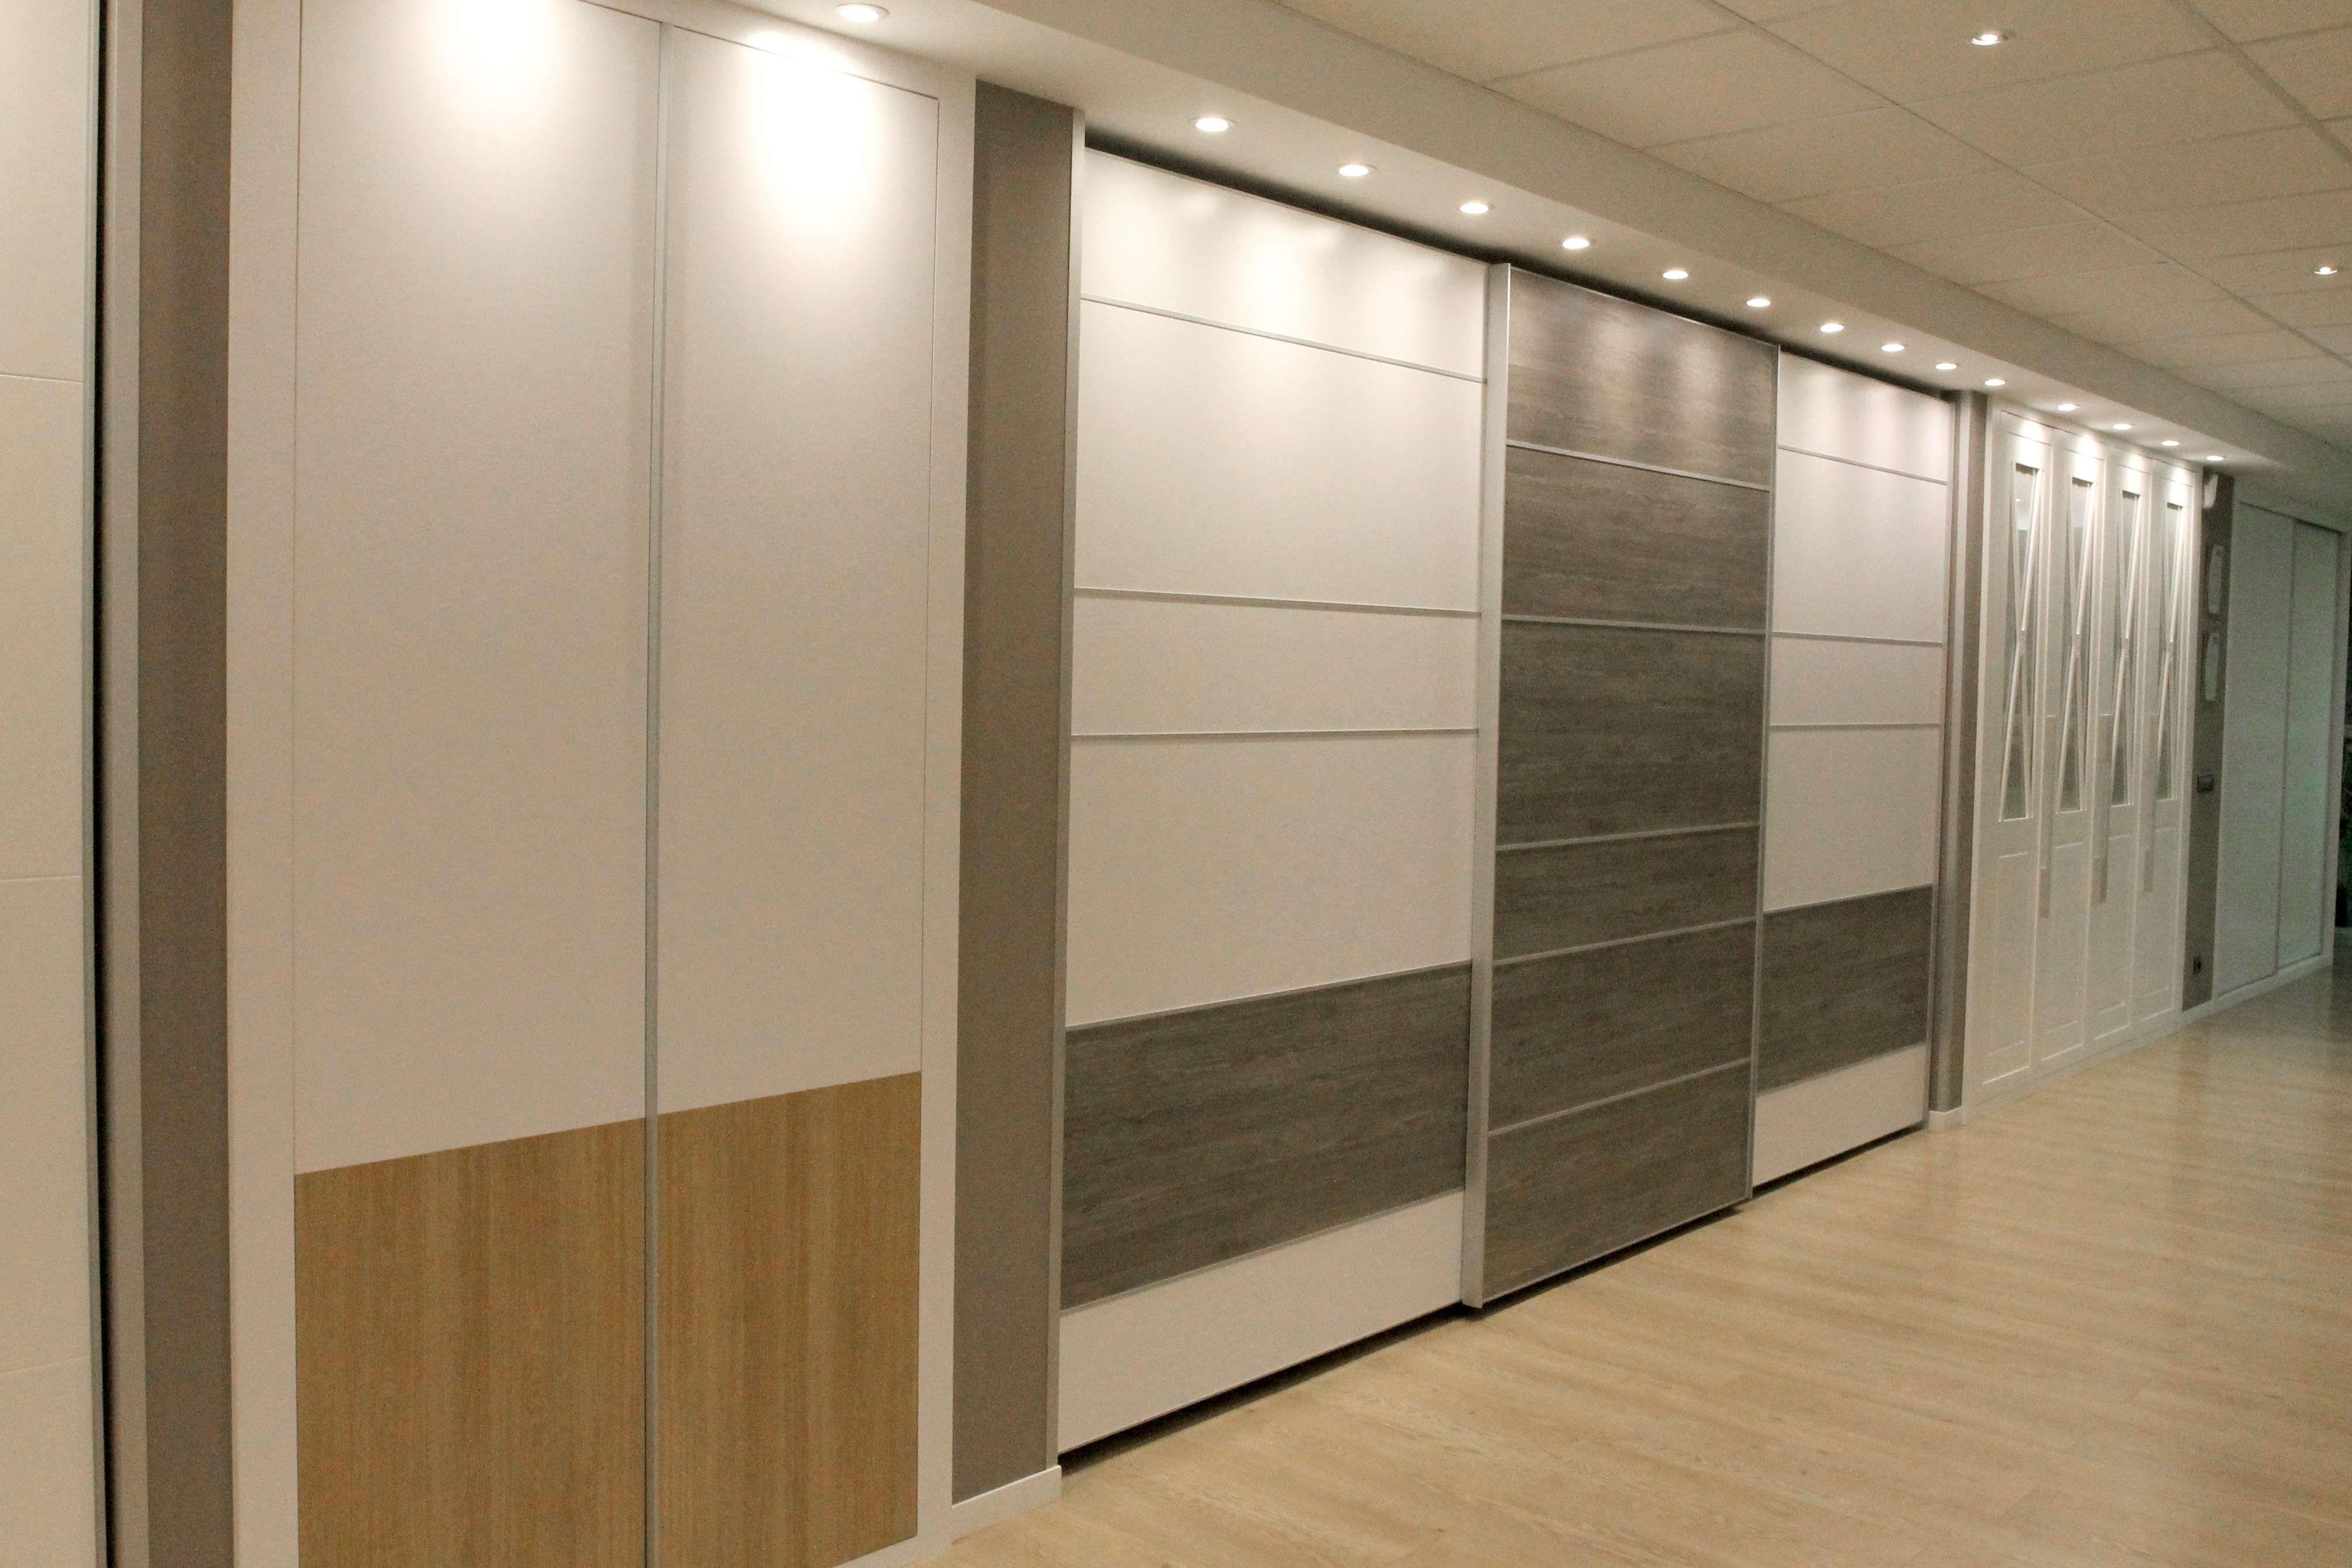 Empresa especializada en armarios a medida en Guipúzcoa